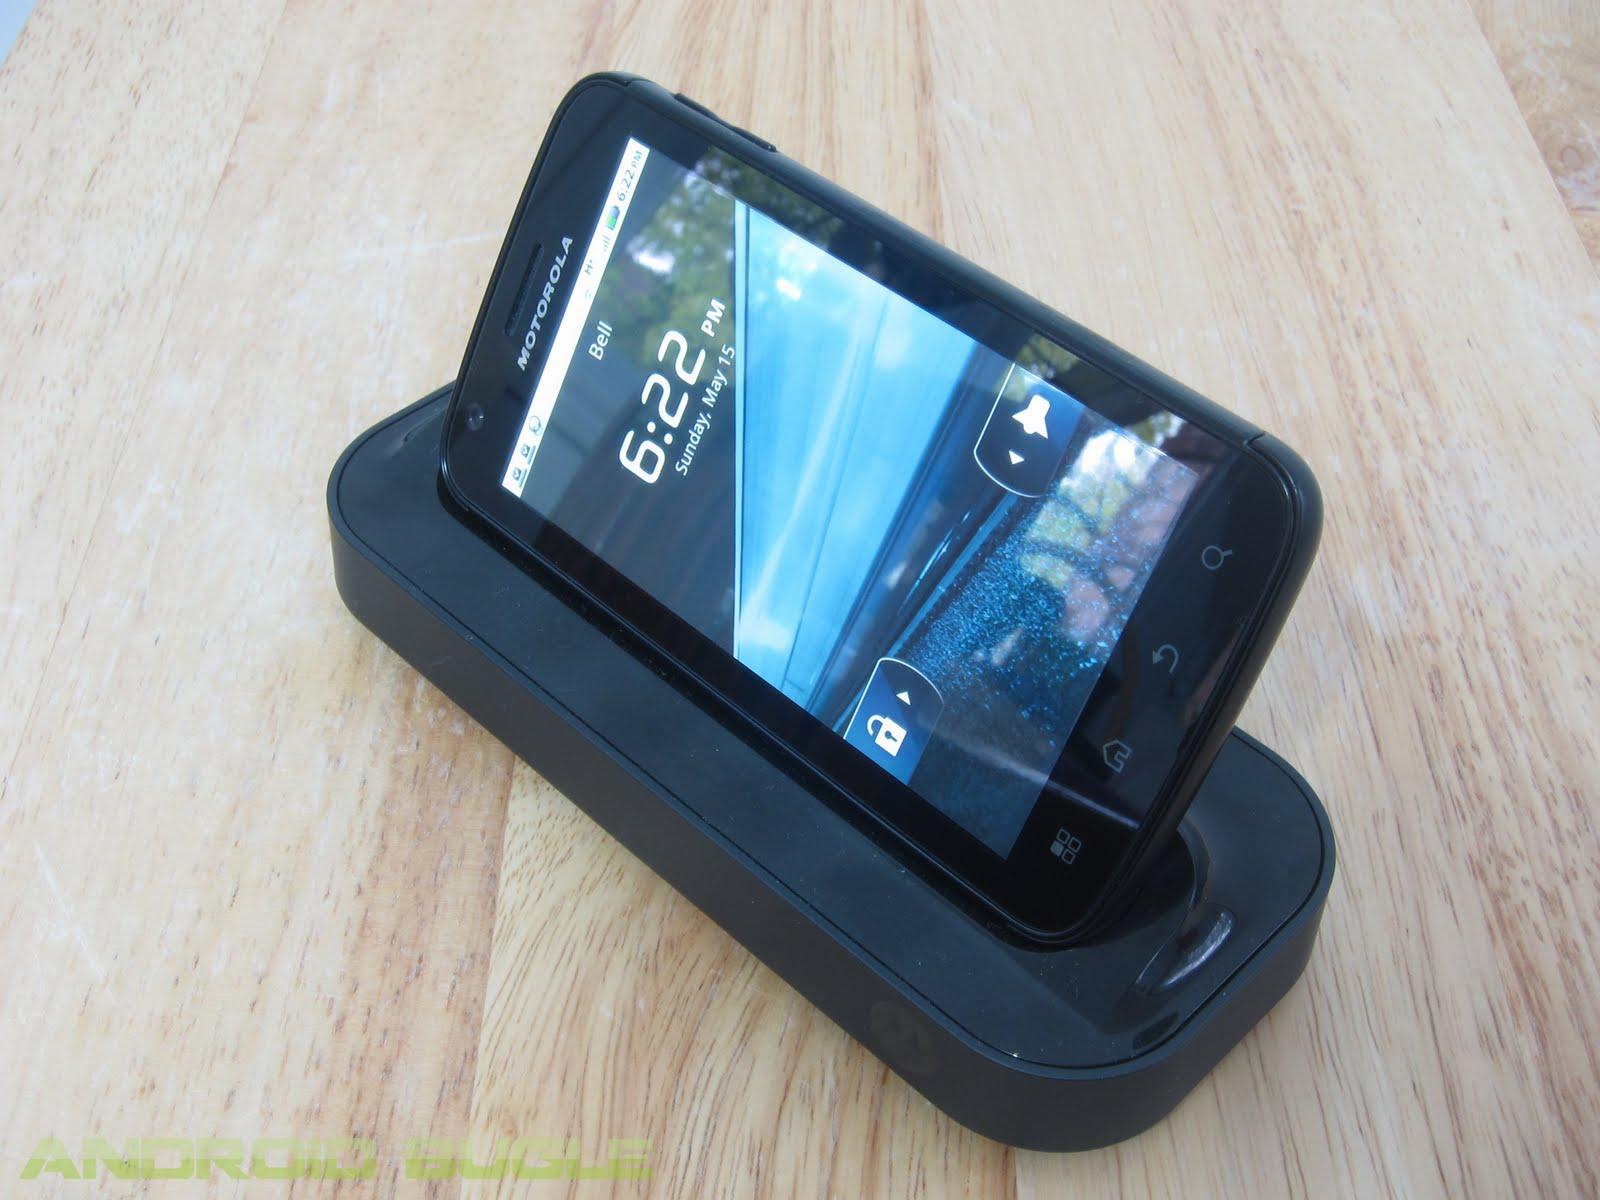 Tempat Jual Mito Fantasy A99 Android Jellybean Terbaru 2018 Rhythm S1414s06 Jam Tangan Pria Hitam Motorola Mb860 Manual Bean With Rh Gs Array Atrix Bell Best